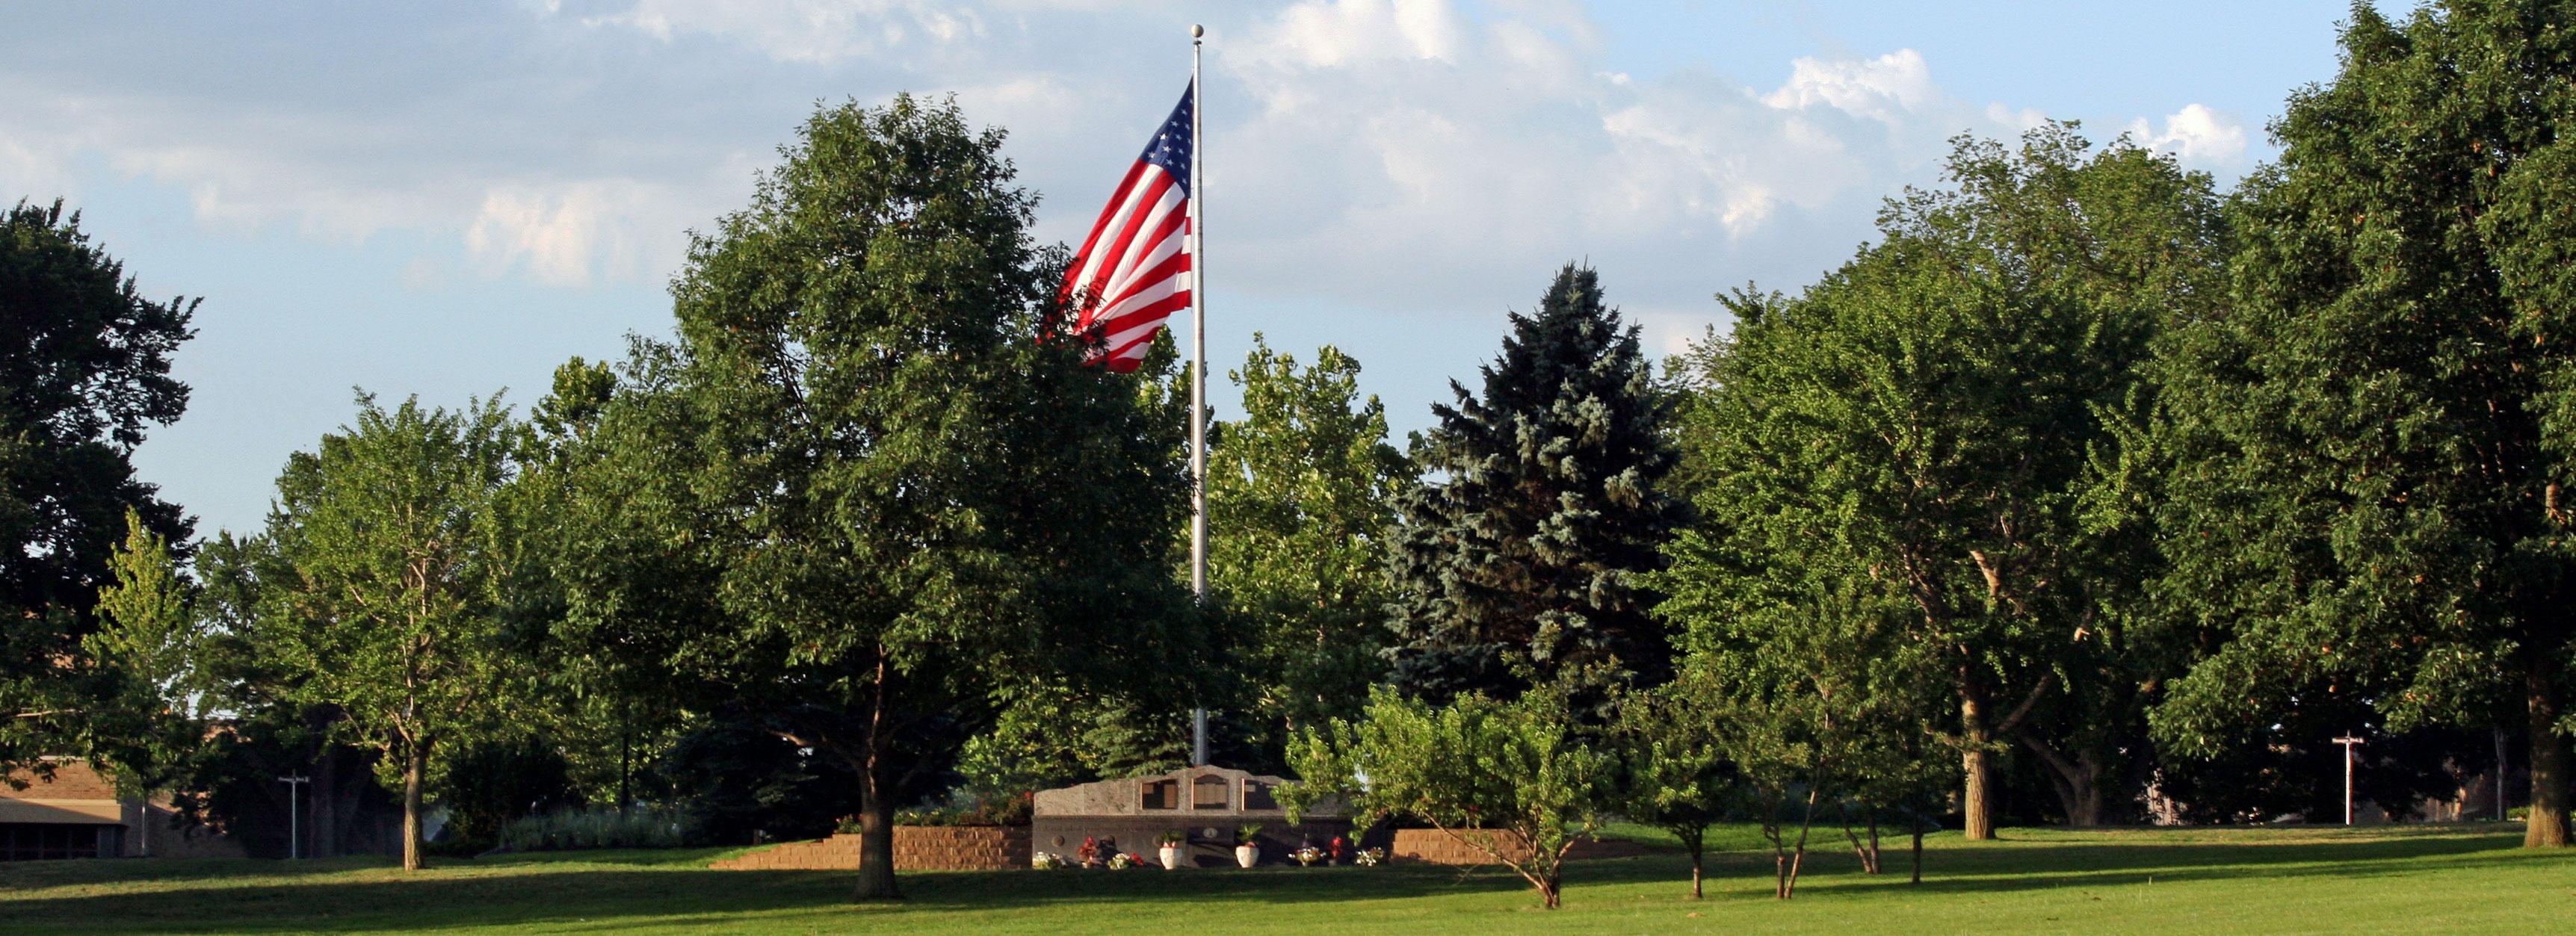 veterans-memorial-banner-version-for-web